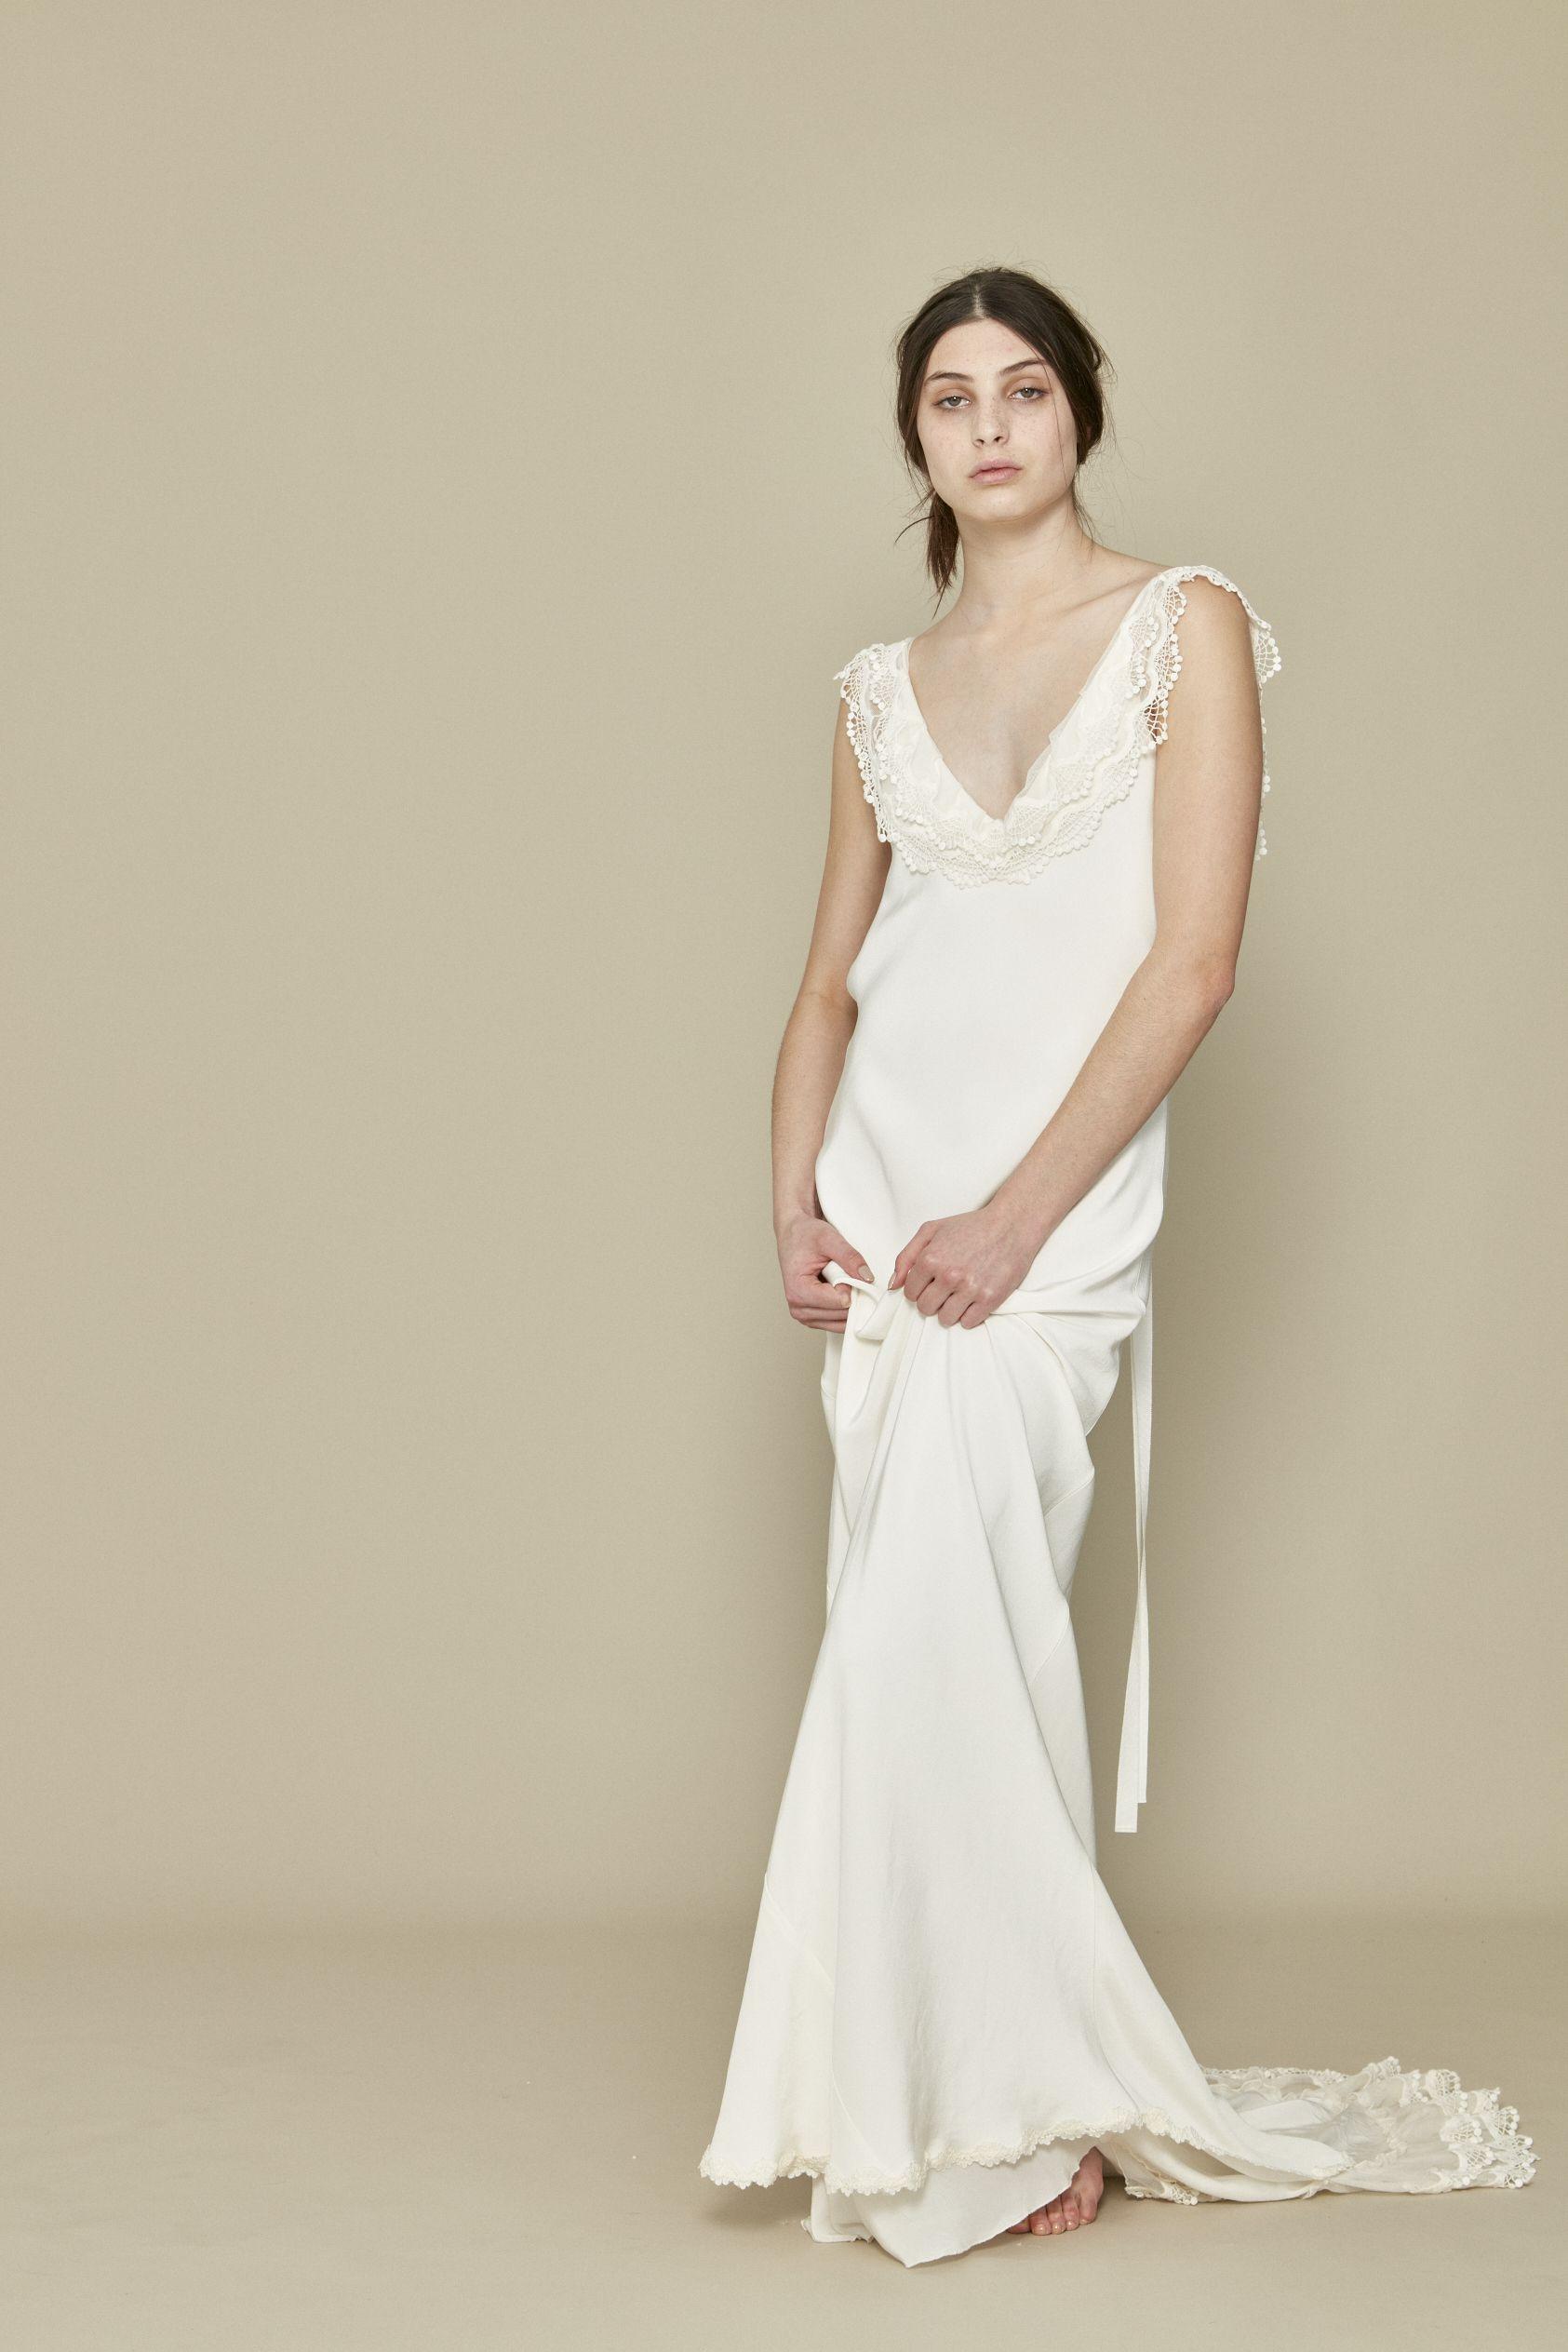 Claudette dress, silk bias cut with lace trimmed train, modern bride ...